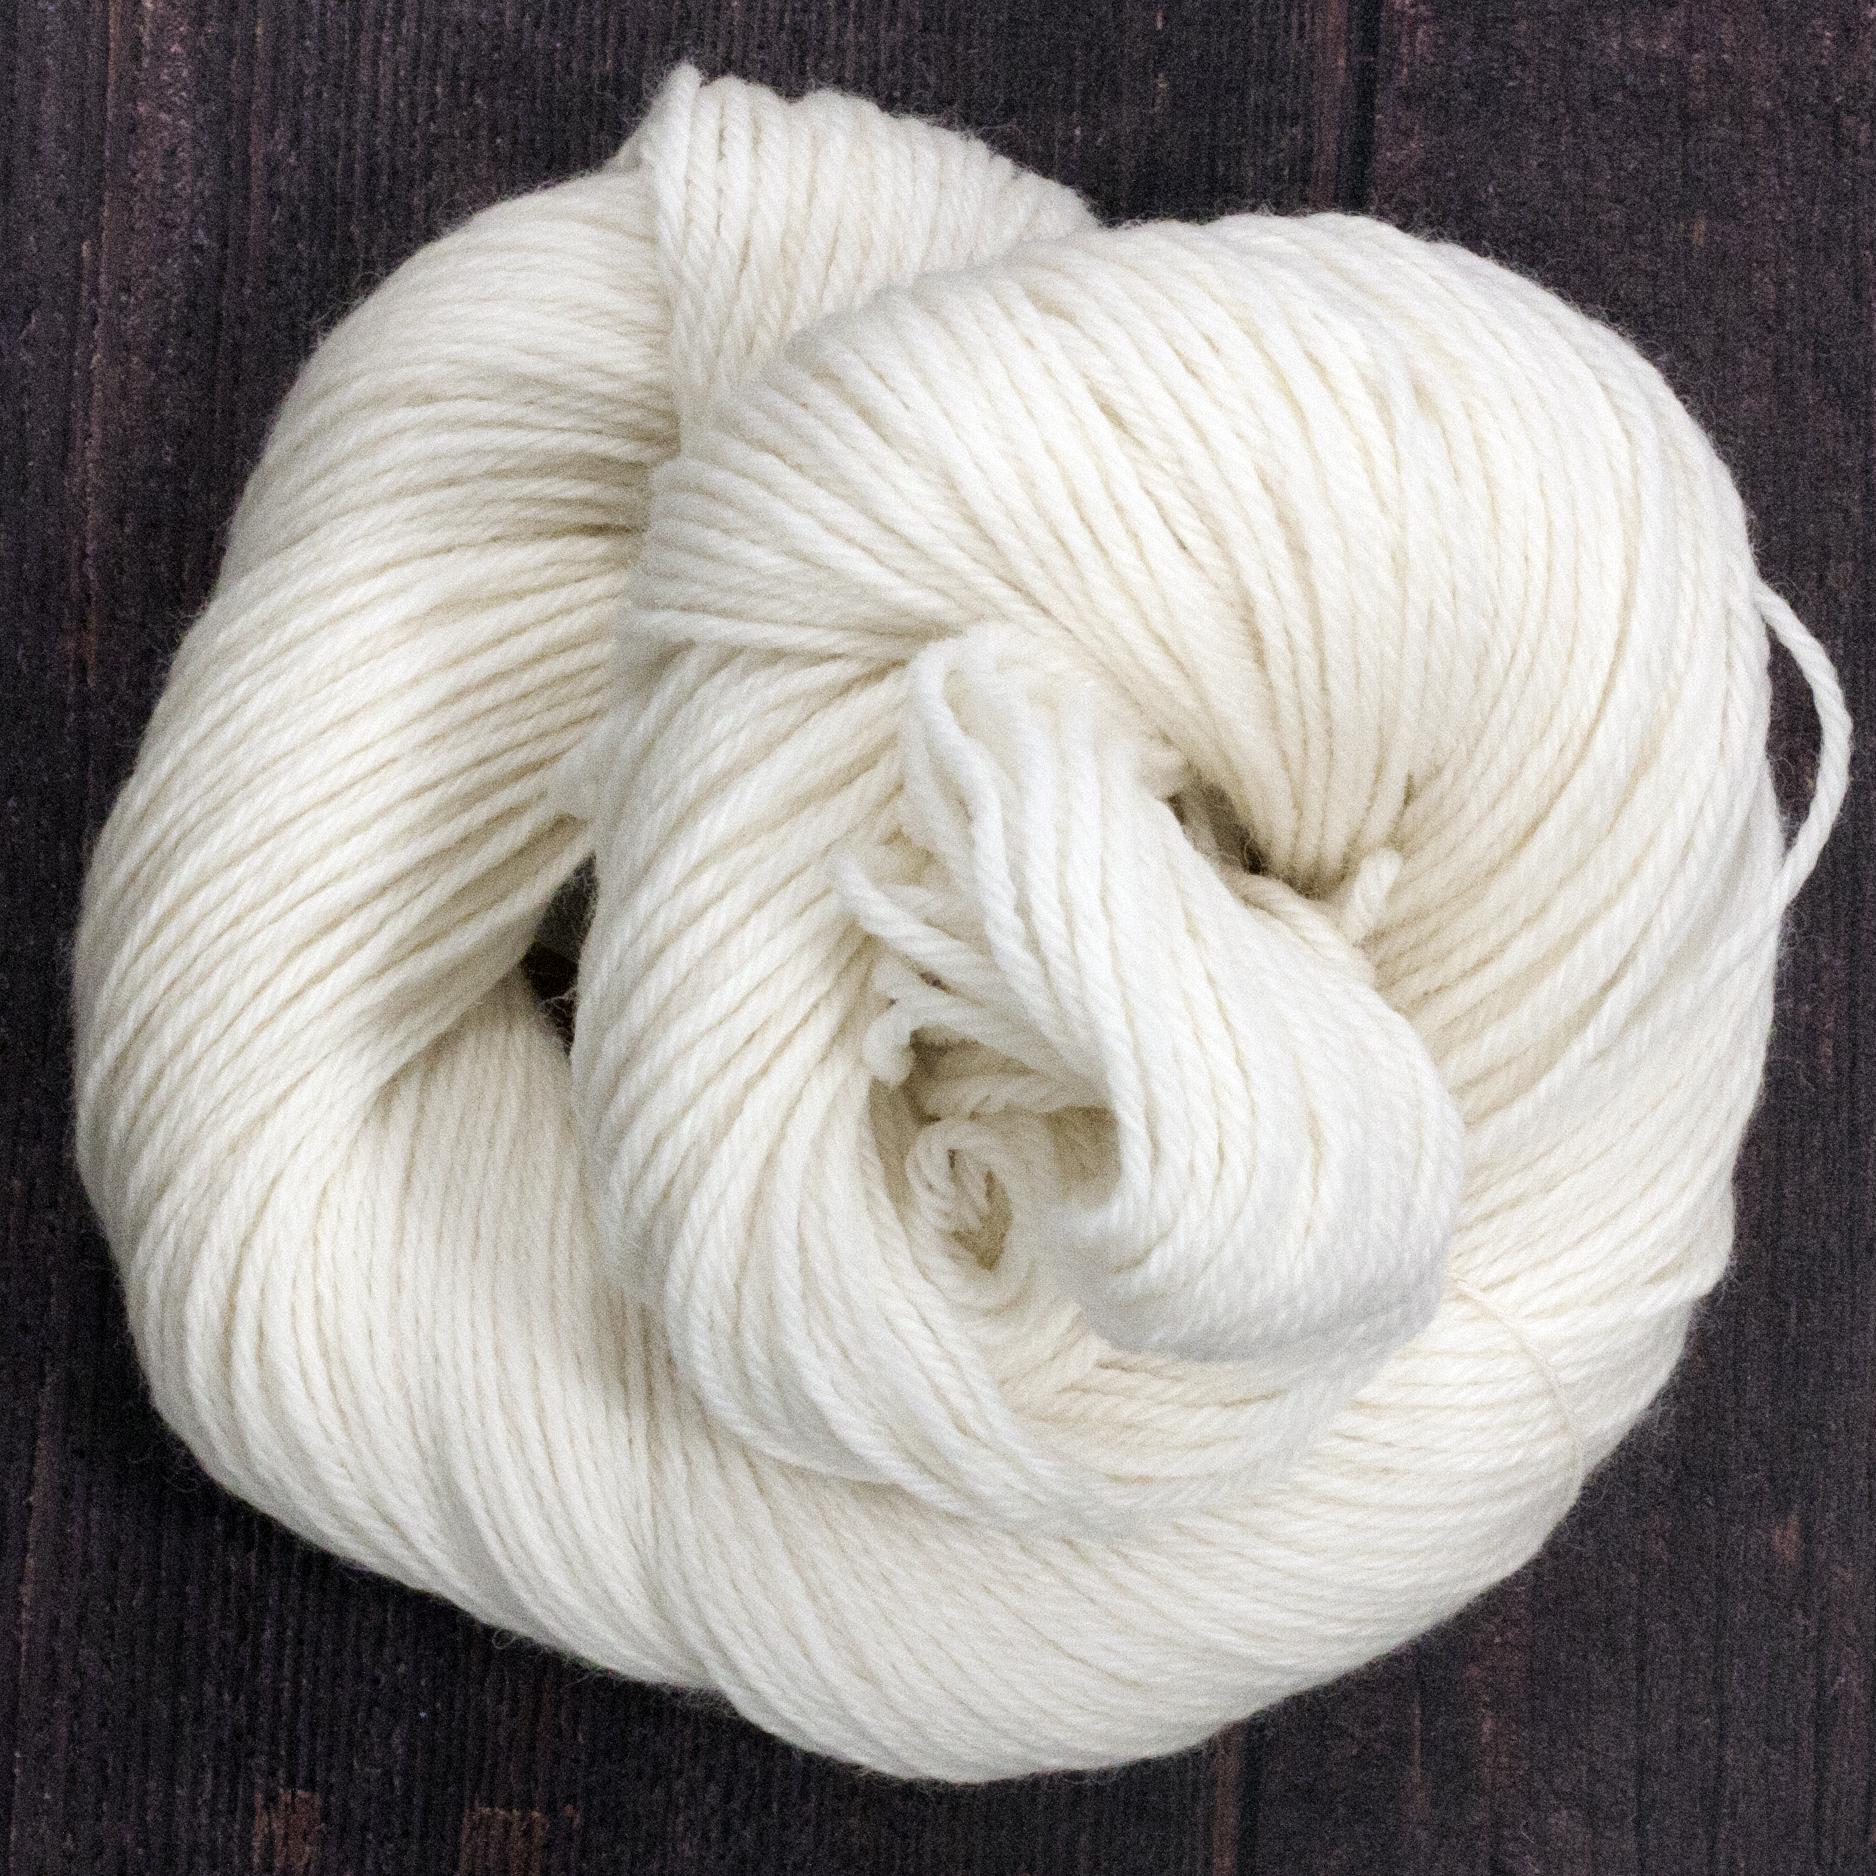 Type 49207  Organic DK 100% Organic South American Merino Wool  100g Hanks 225m per 100g 4/9nm